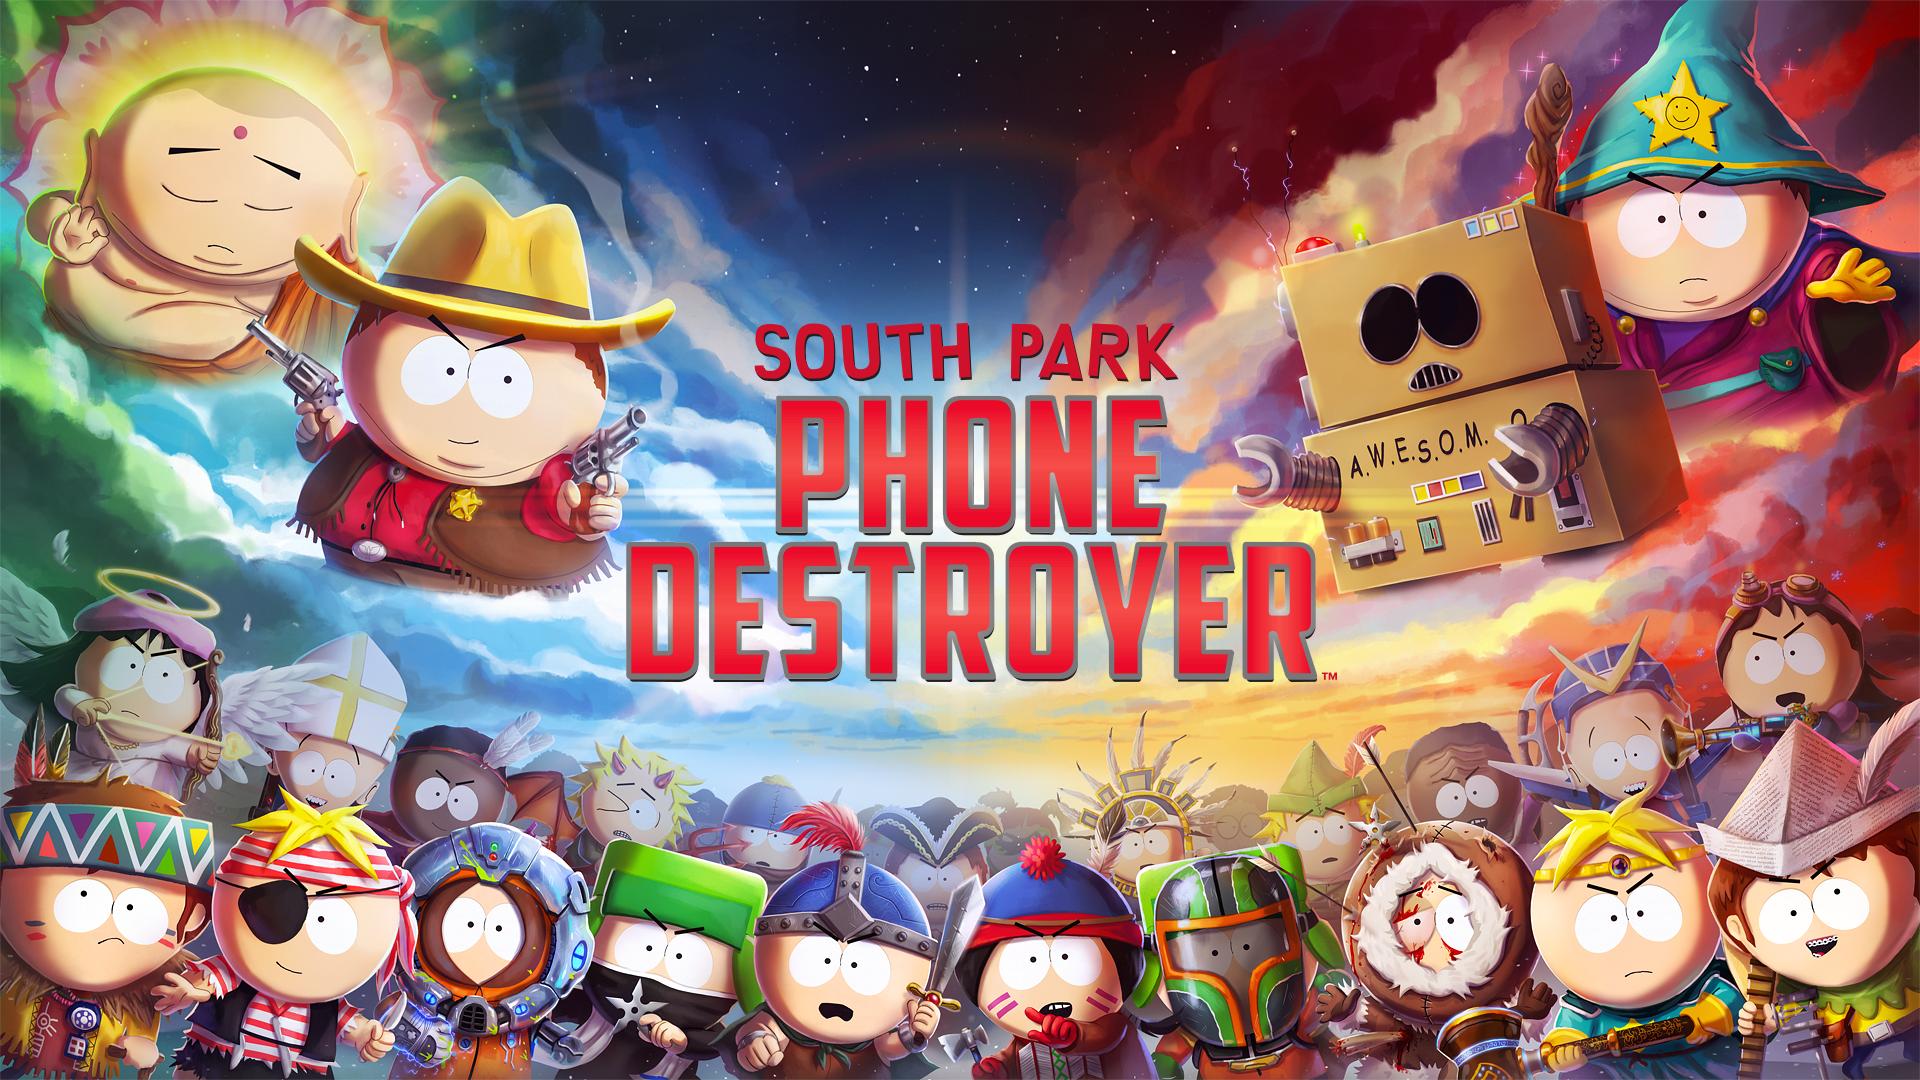 Новая игра South Park: Phone Destroyer предупреждает о миктротранзакциях